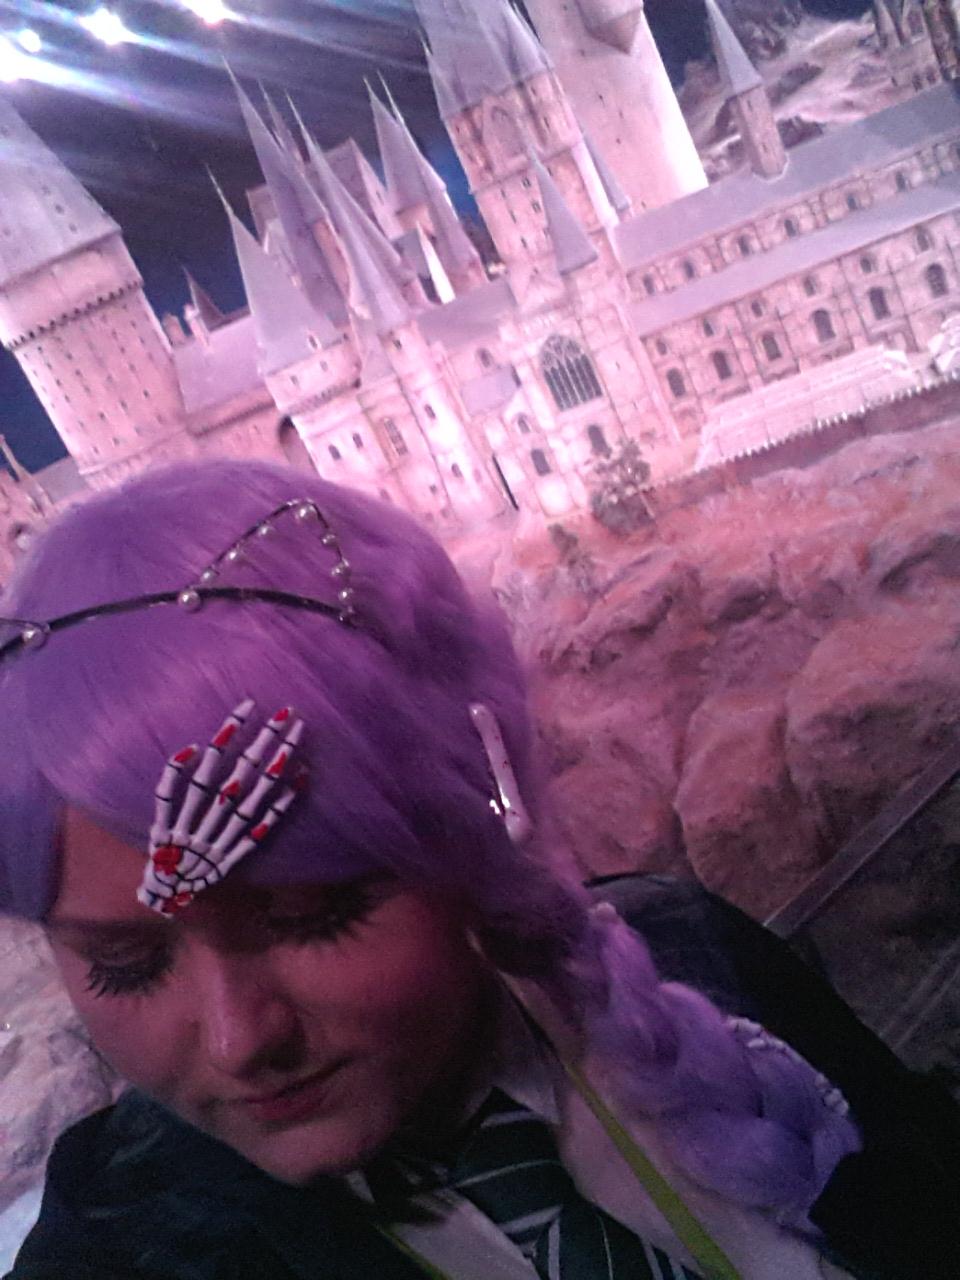 Scale model Hogwarts castle